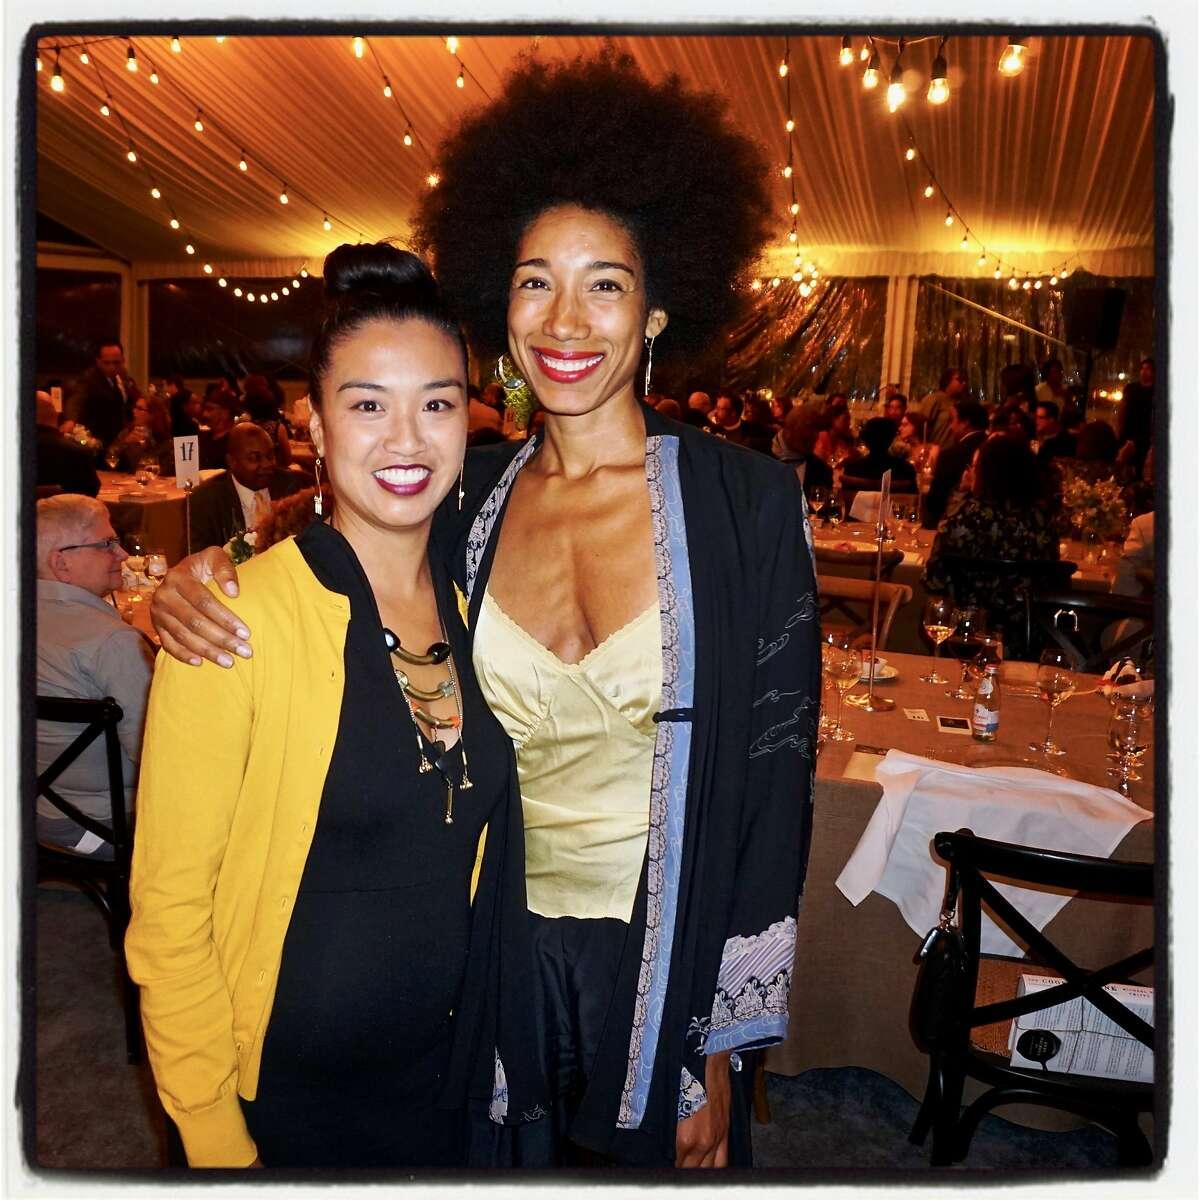 Jidan Terry-Koon (left) with actor-director Renee Wilson at the MoAD Diaspora Dinner. Aug. 29, 2017.